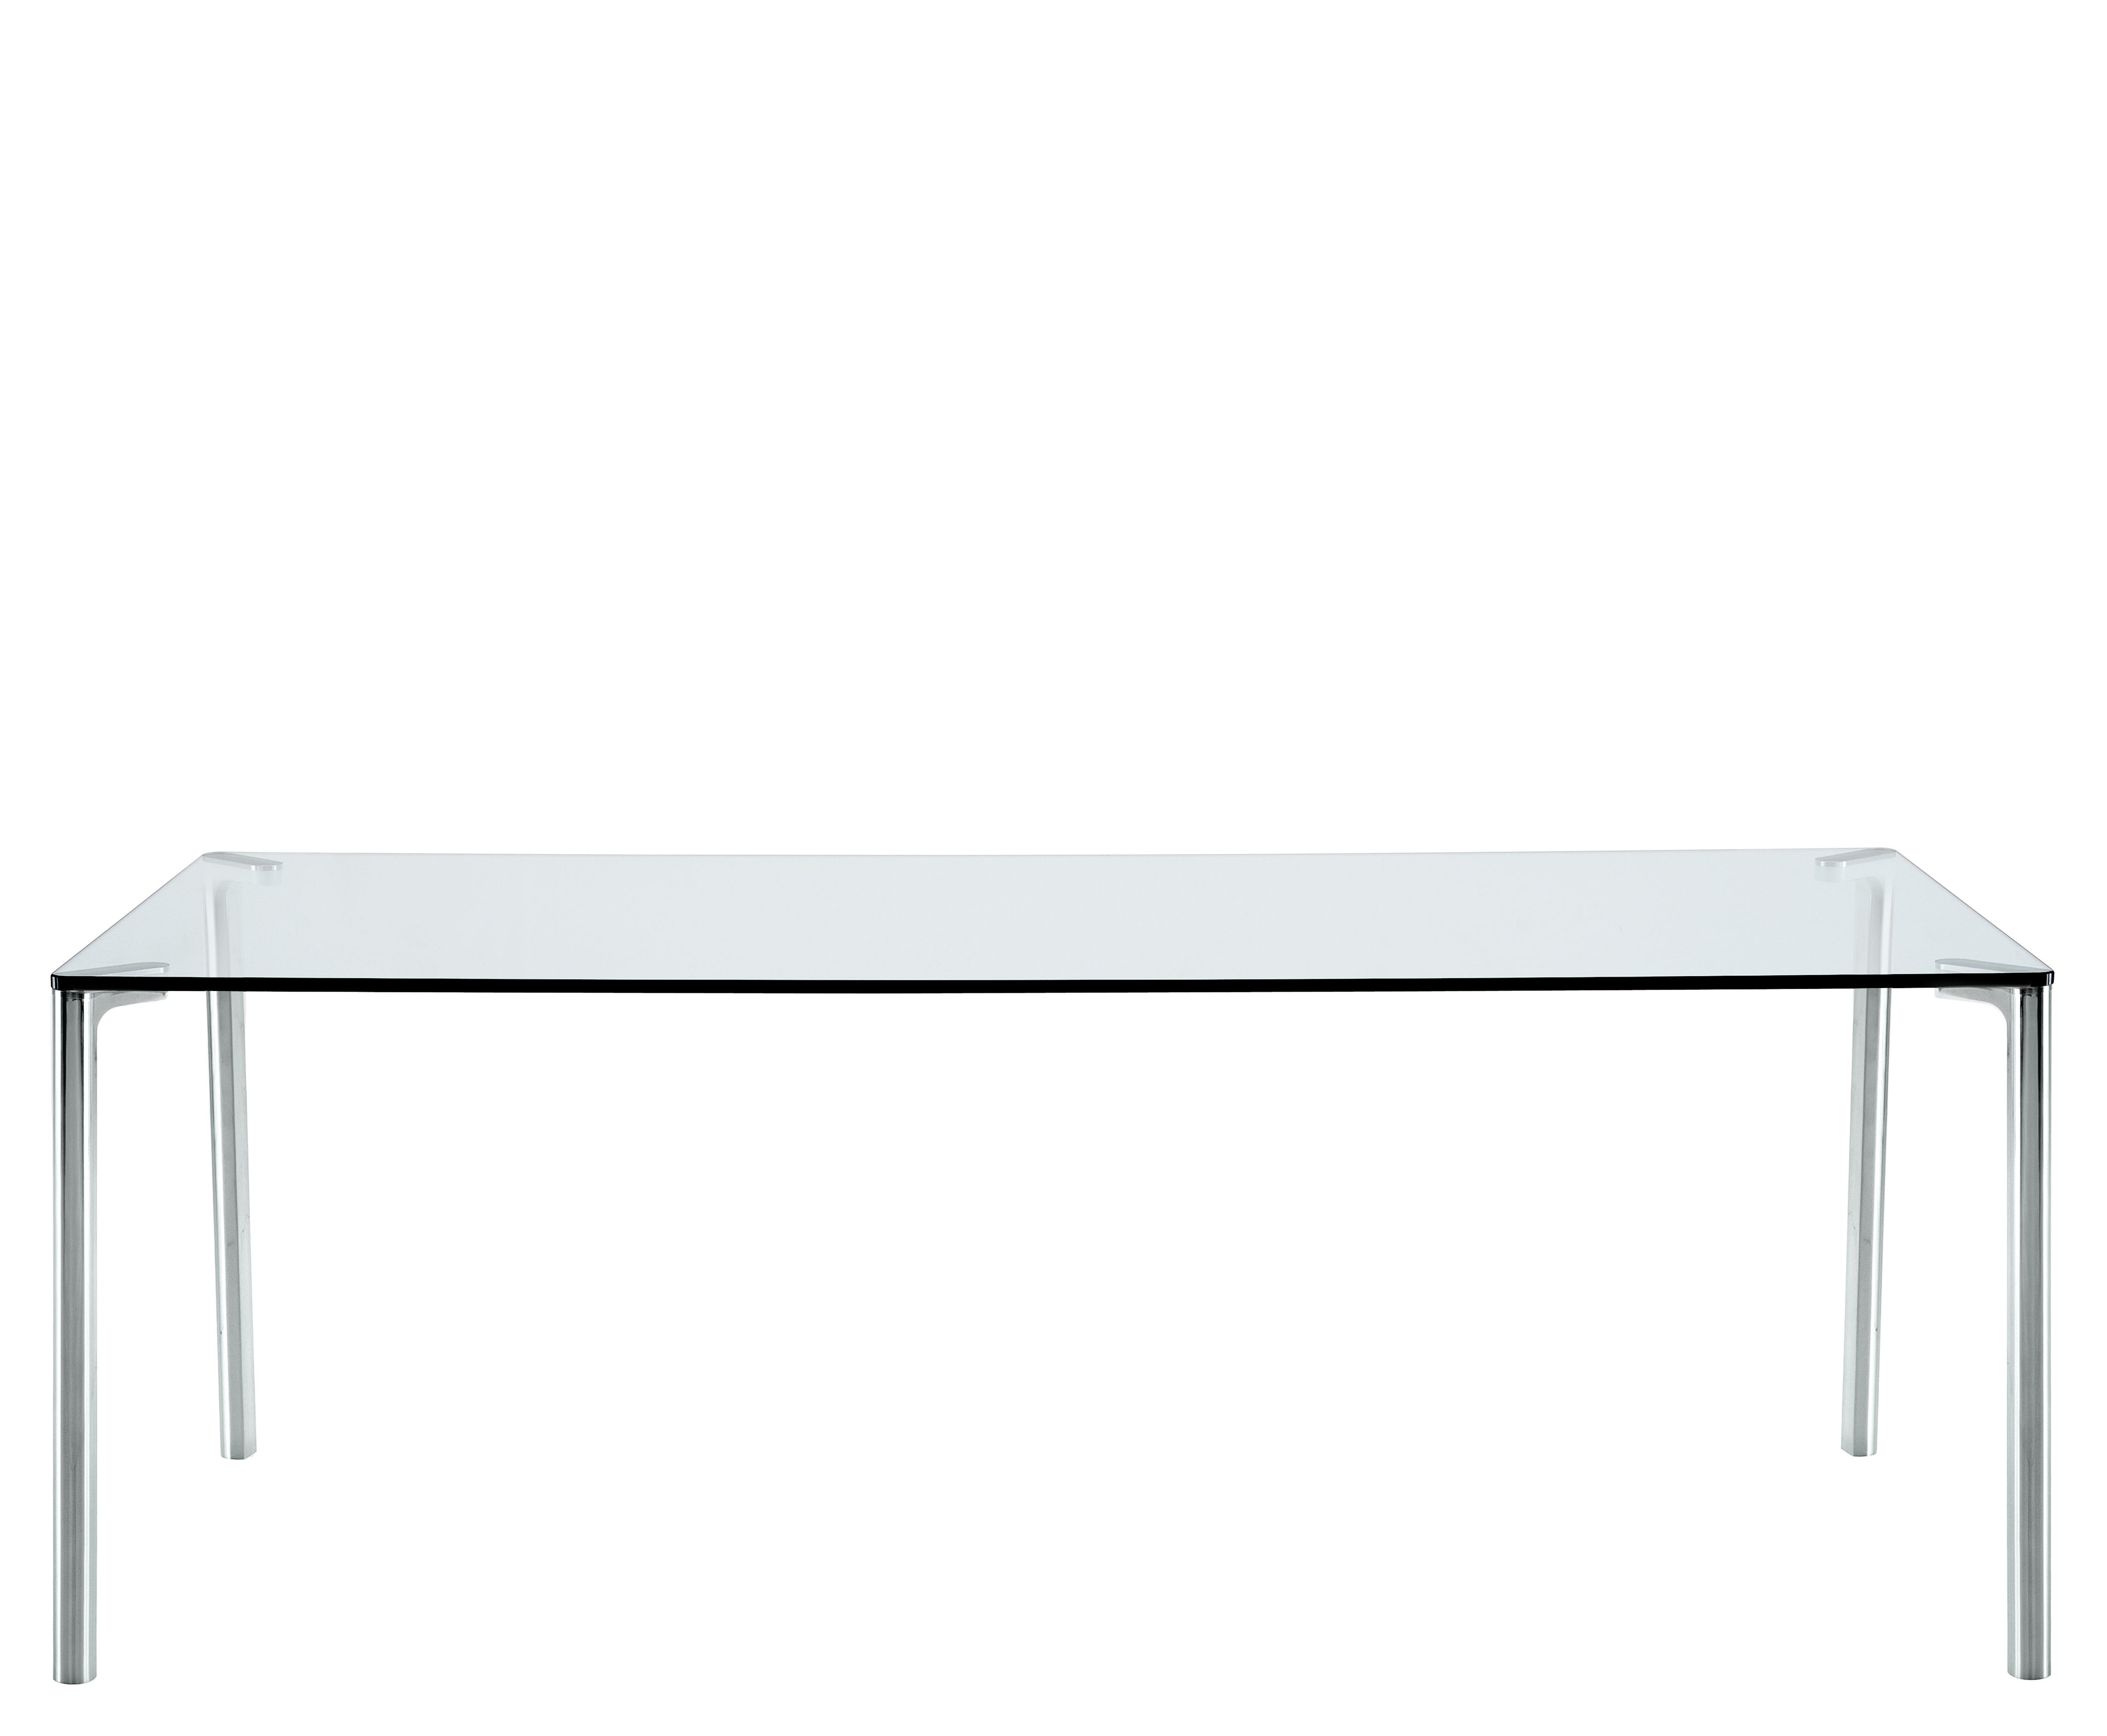 Mobilier - Tables - Table Spillo / 200 x 100 cm - Zanotta - Plateau transparent / Pieds alu poli - Aluminium, Verre trempé